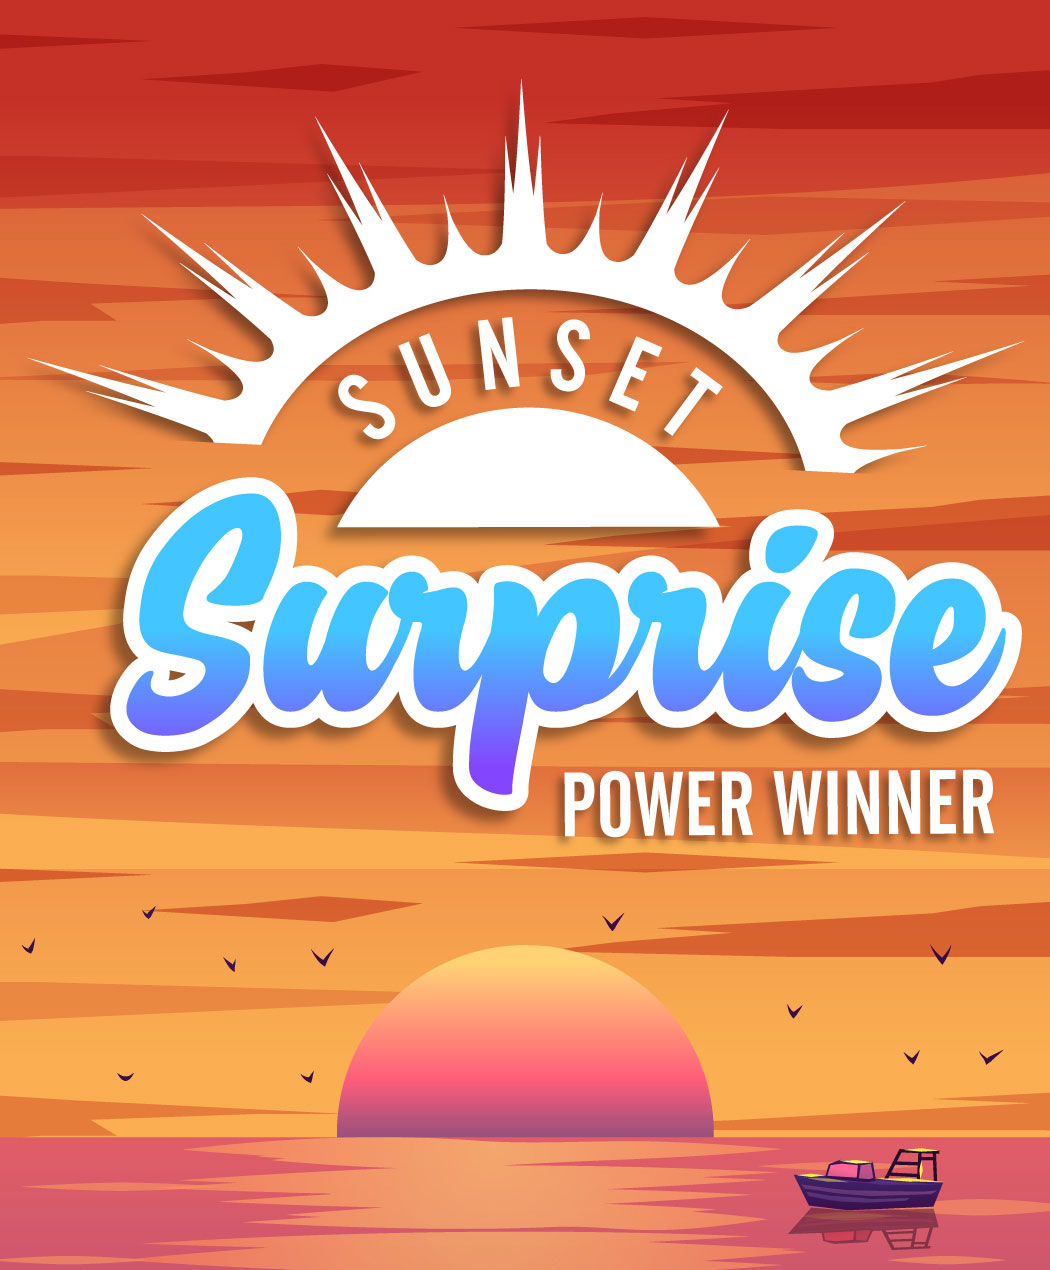 Sunset Surprise Power Winner